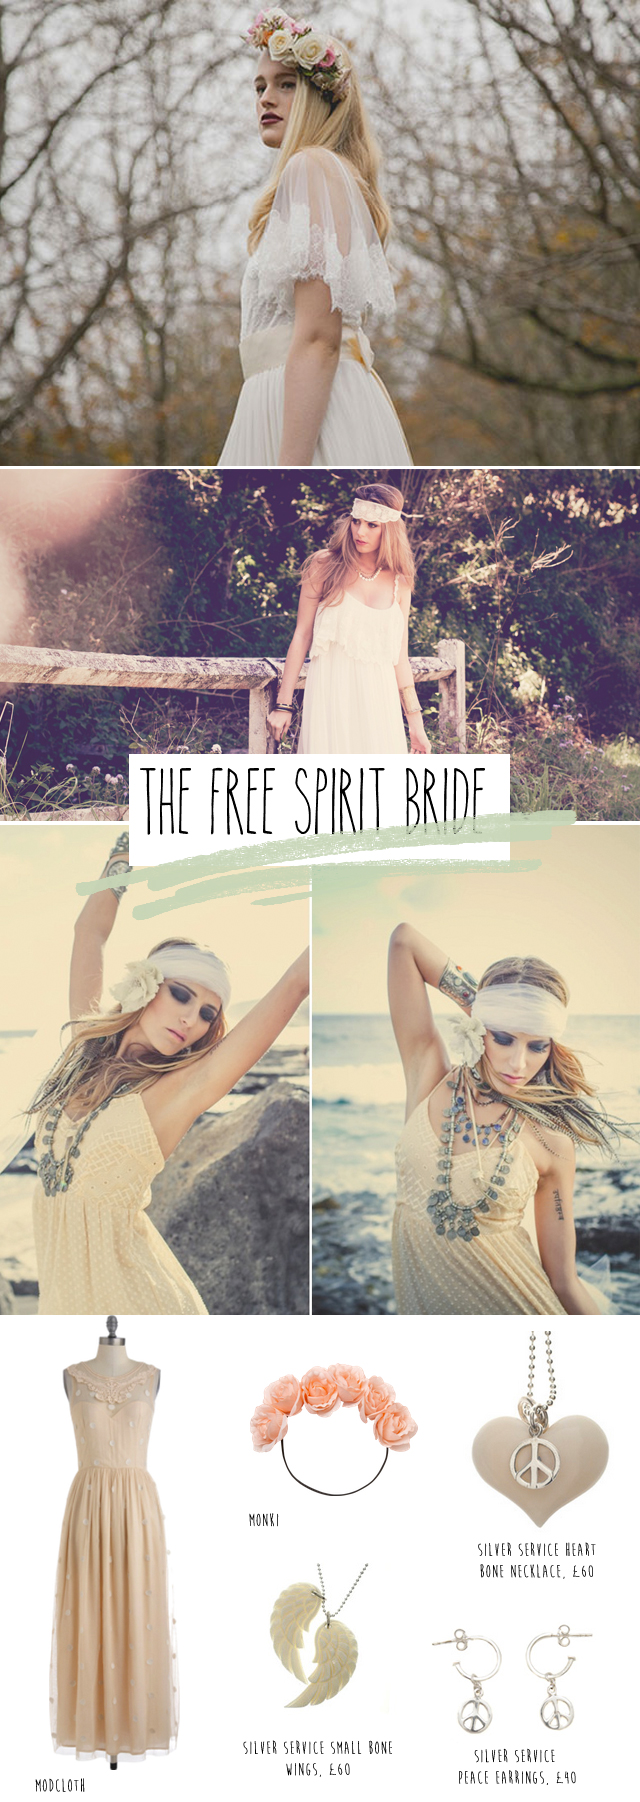 The Free Spirit Bride